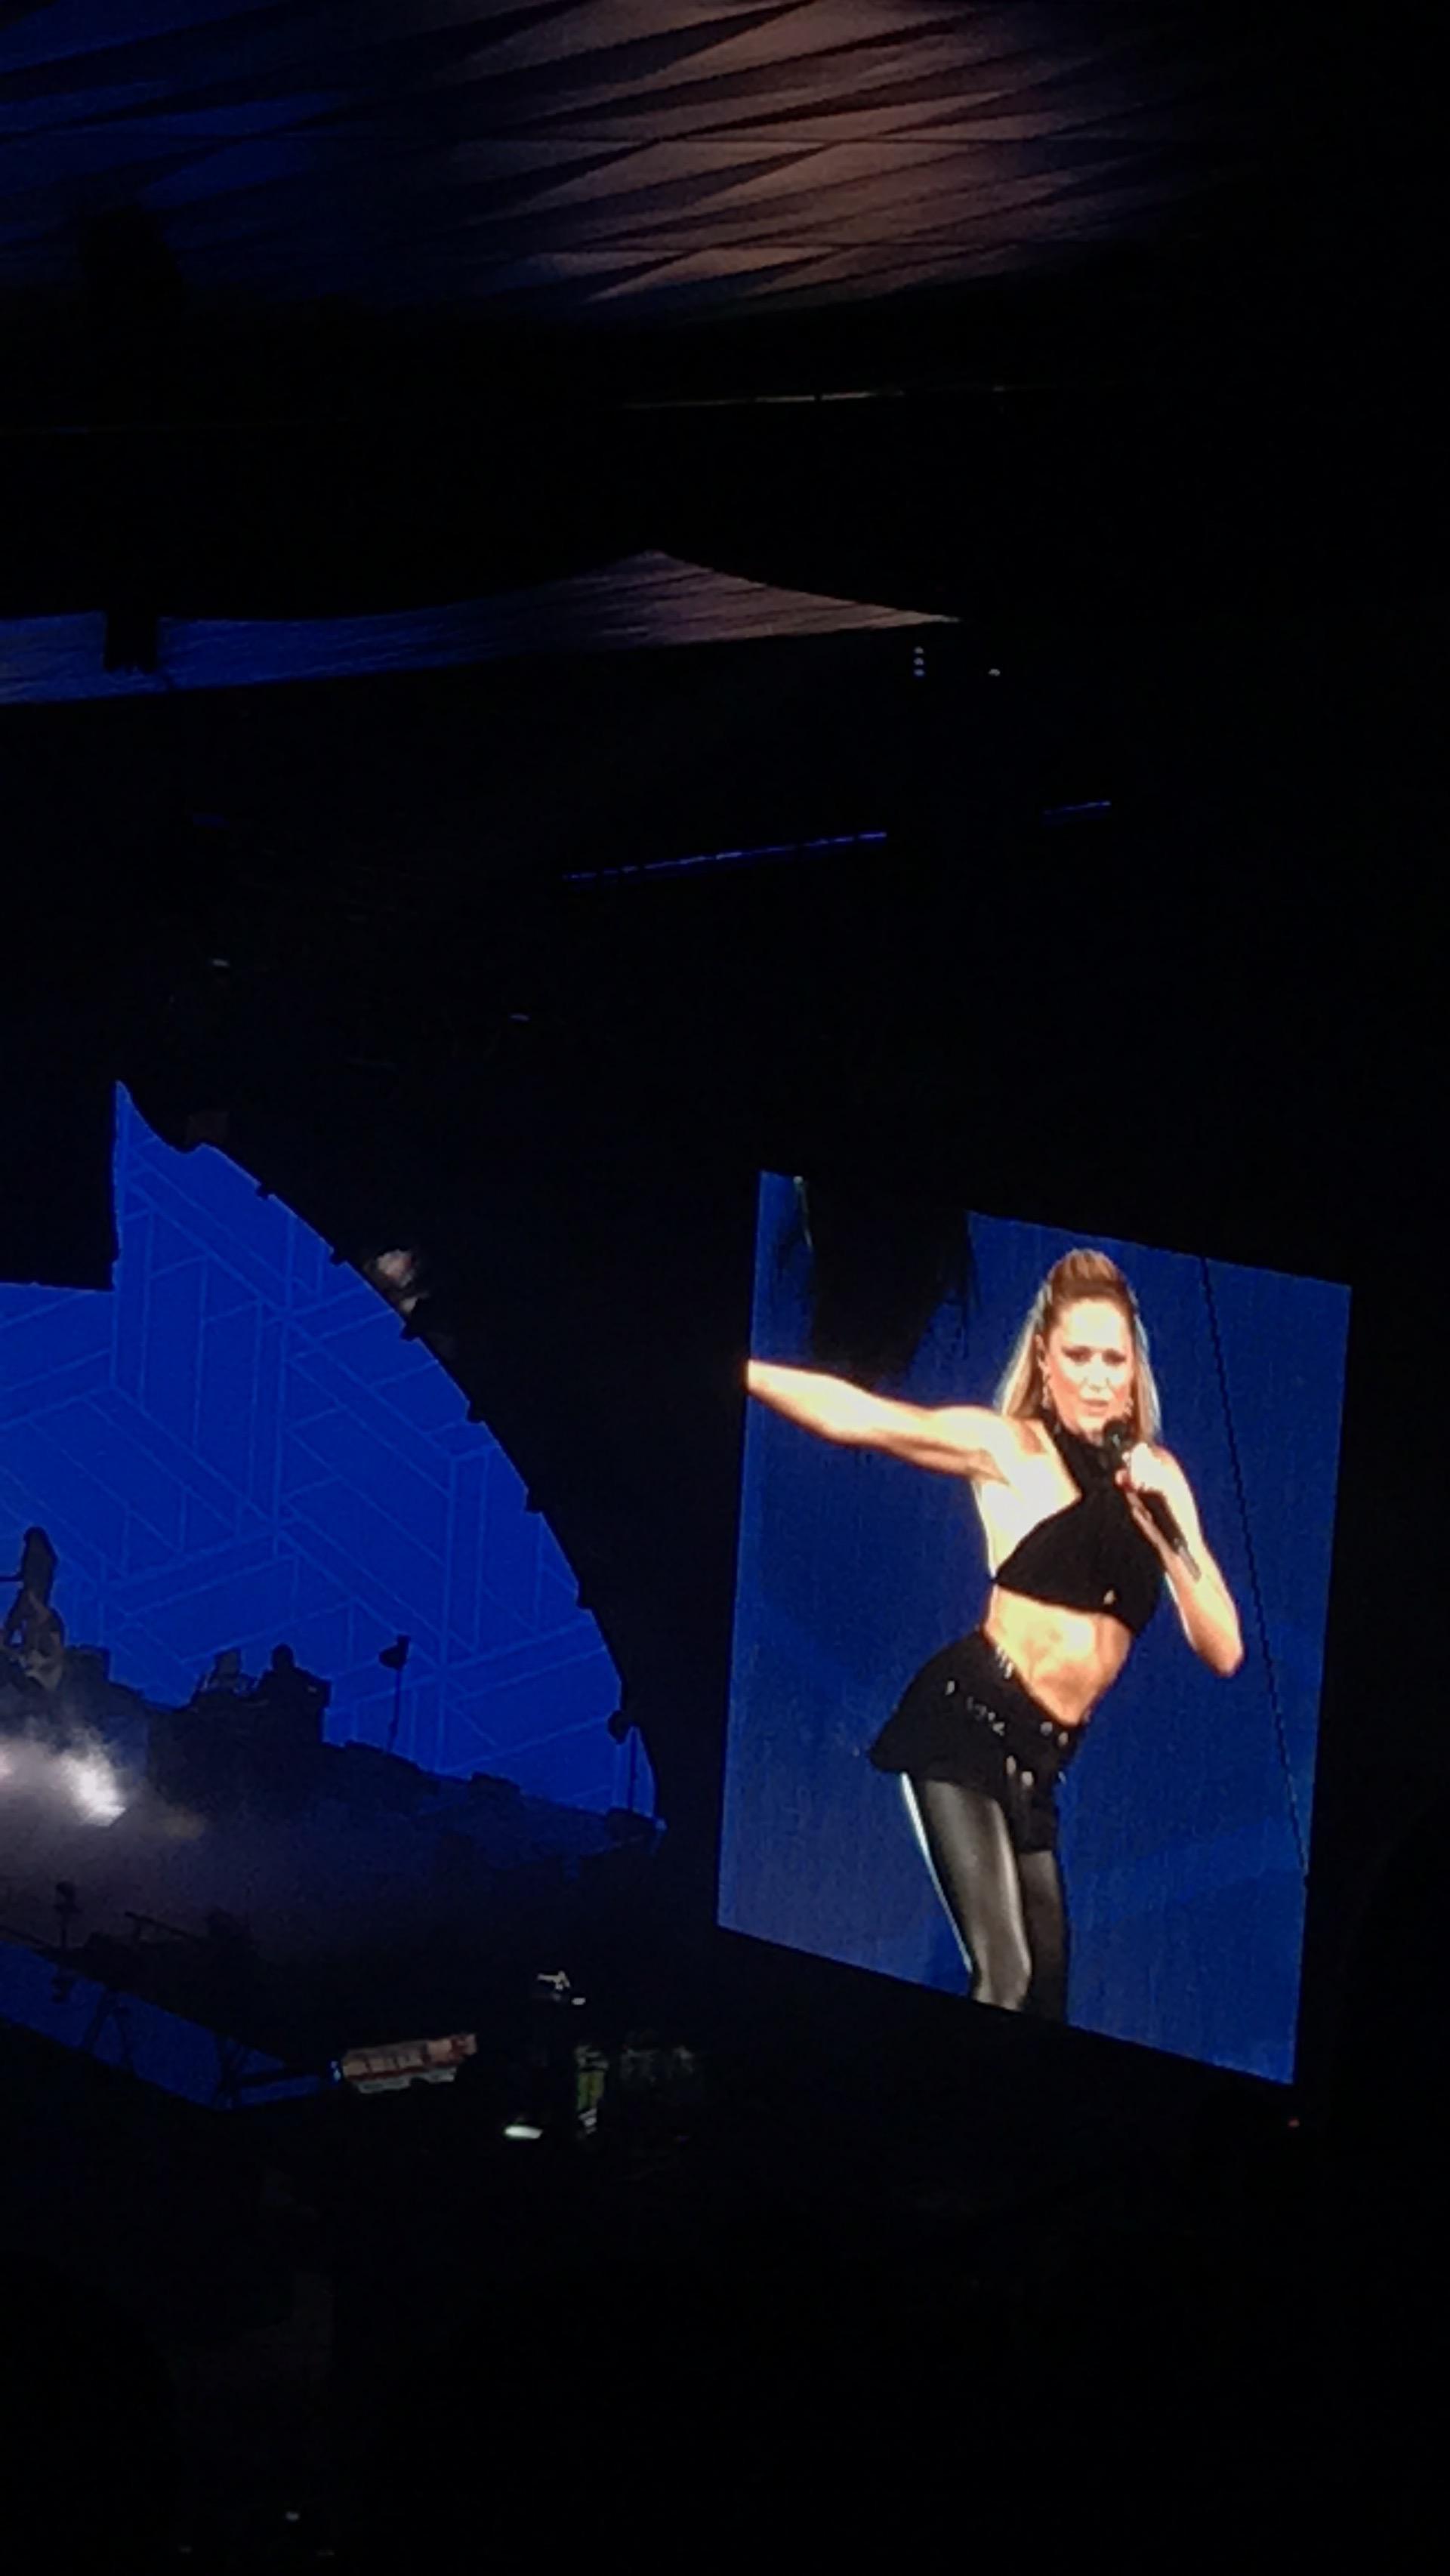 Helene Fischer 2017/18 Tour Wien